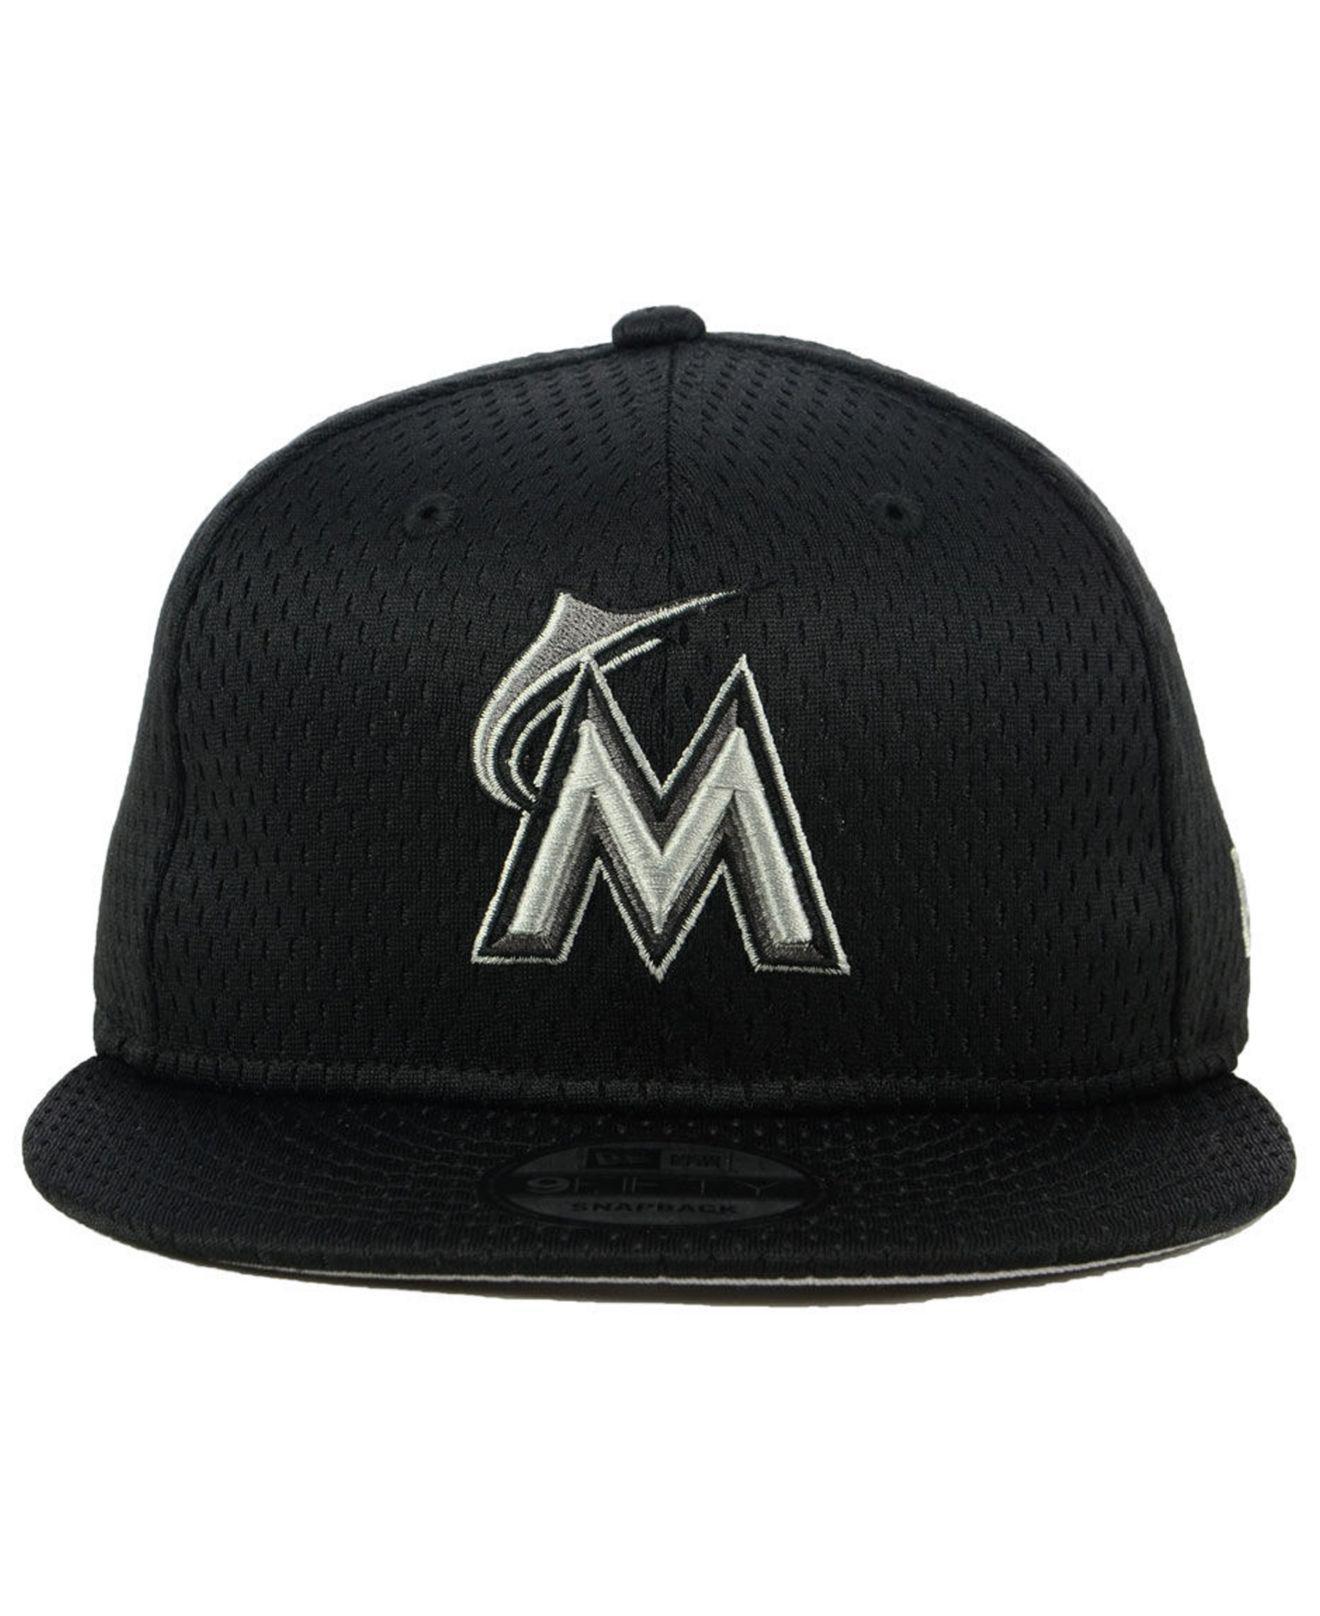 540ffae6cb7fe5 coupon for lyst ktz miami marlins batting practice mesh 9fifty snapback cap  in black for men